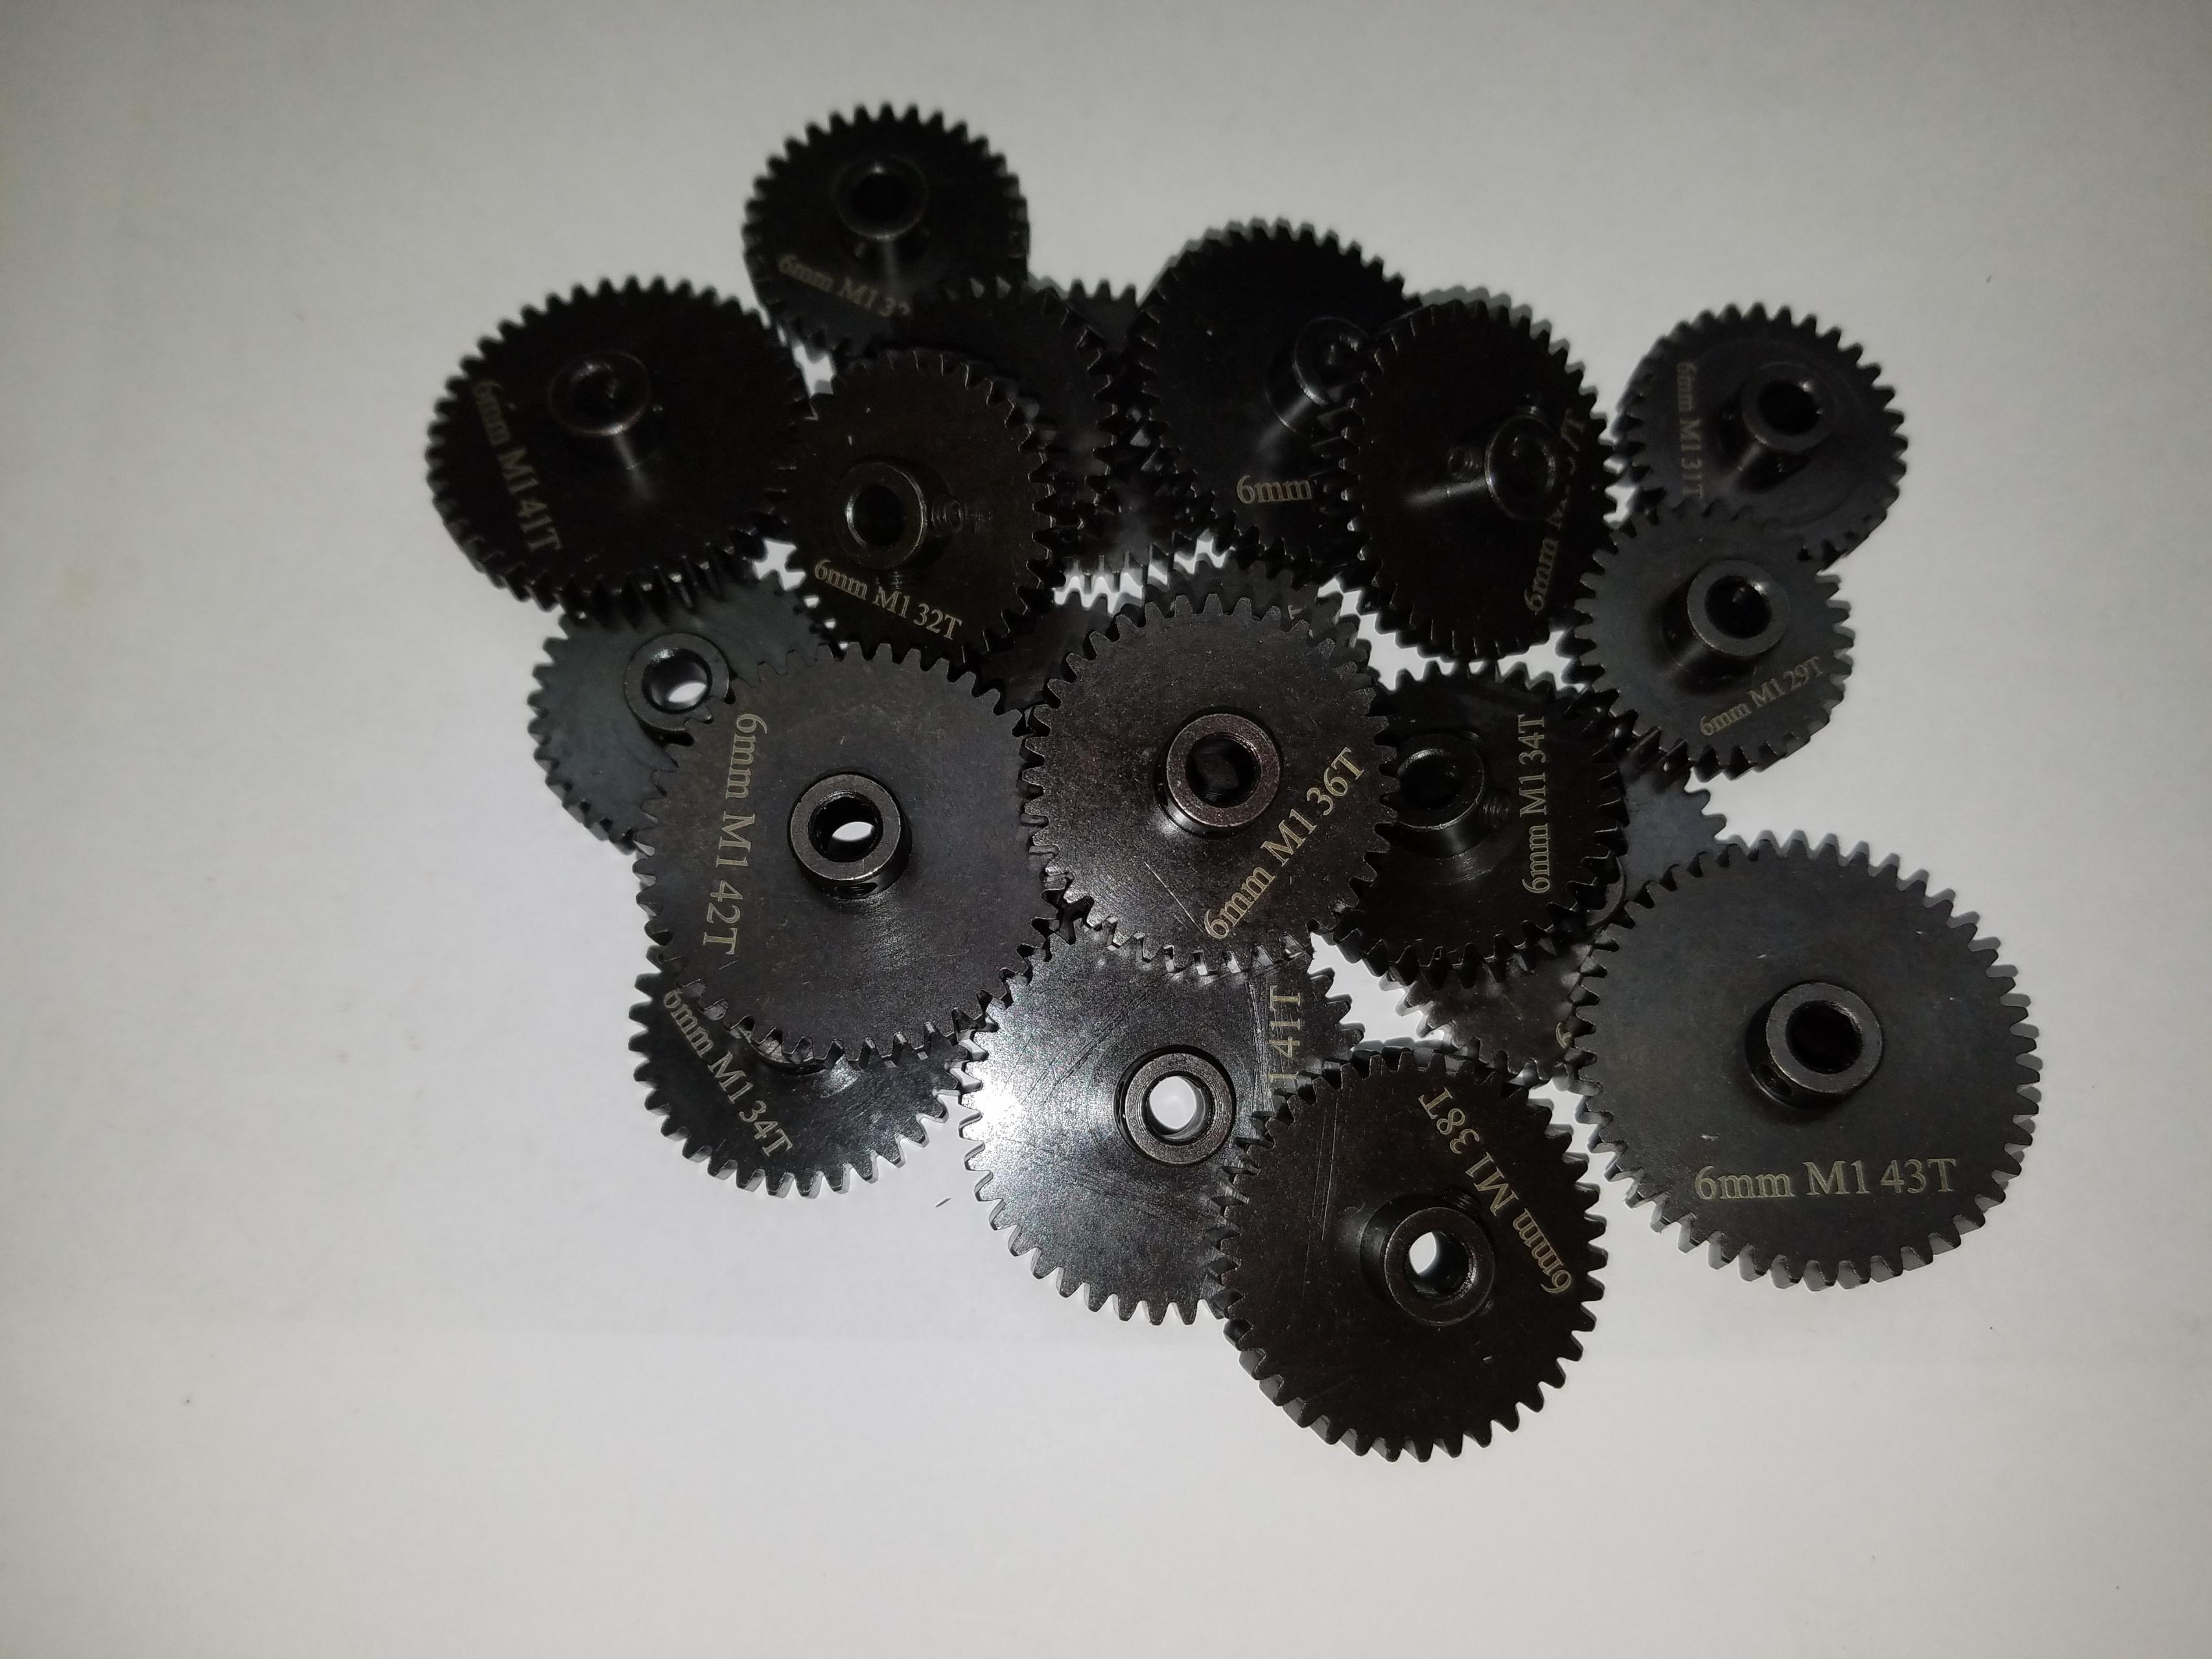 Sagacustomrc 1-8mm Pinion Gears 24t mod 1